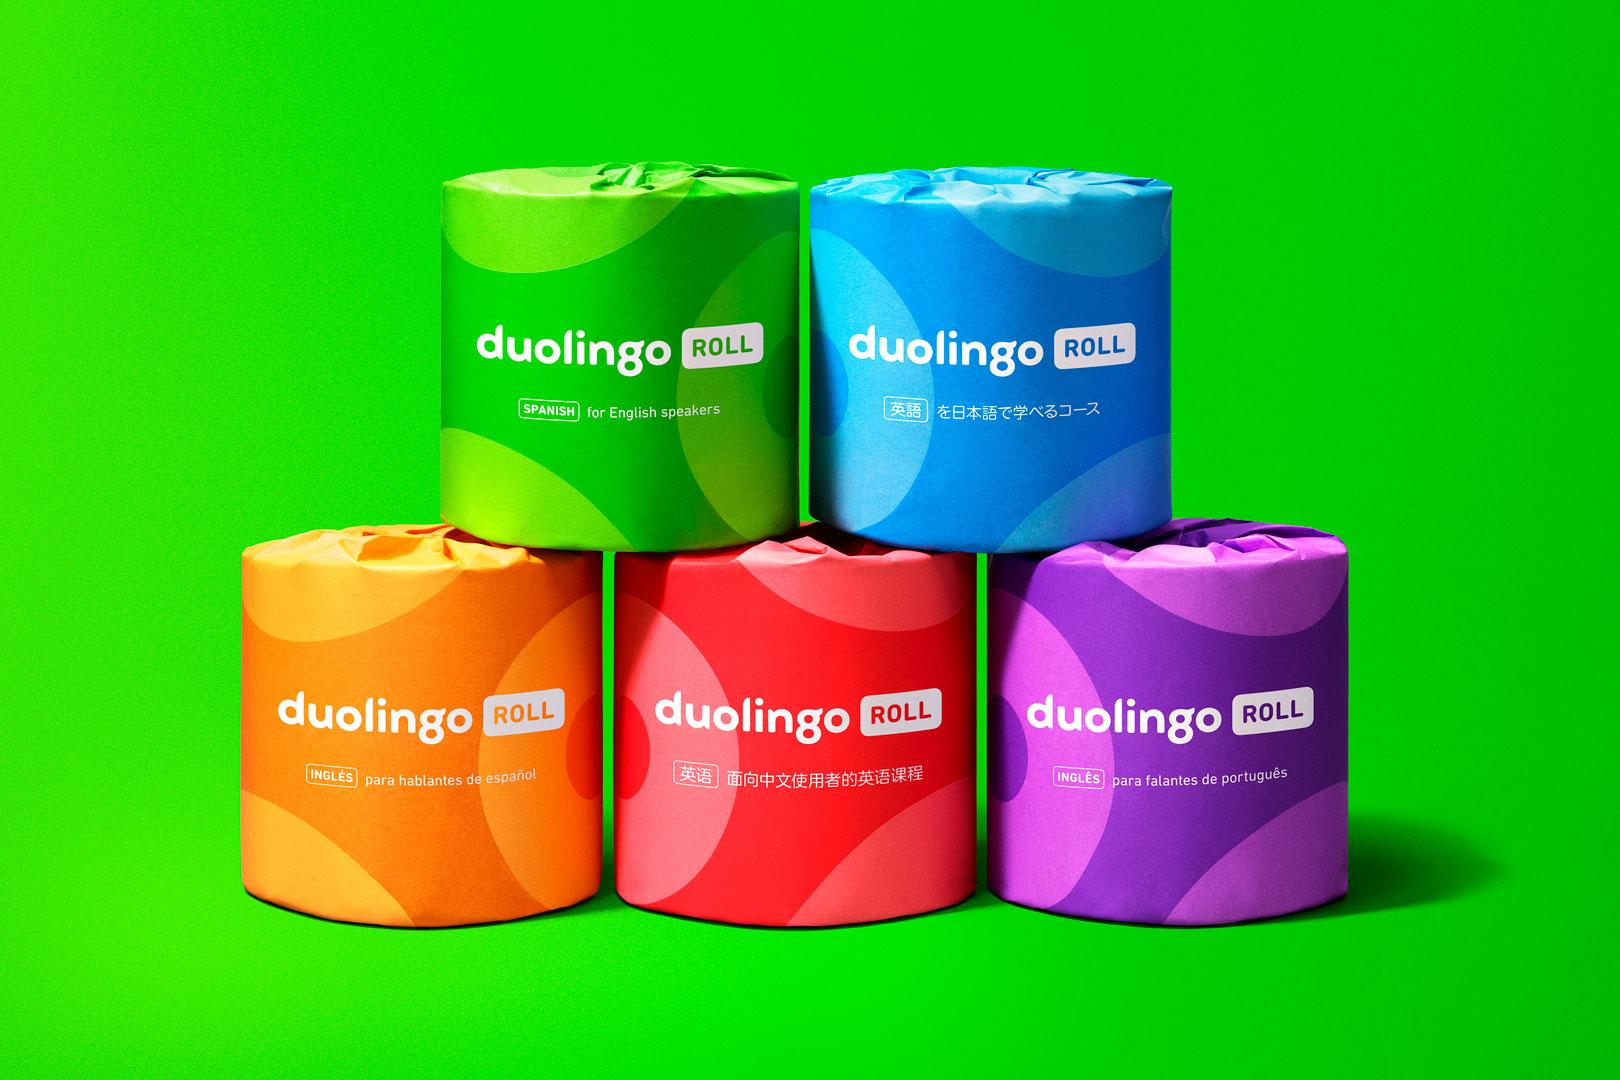 Duolingo: Duolingo Roll